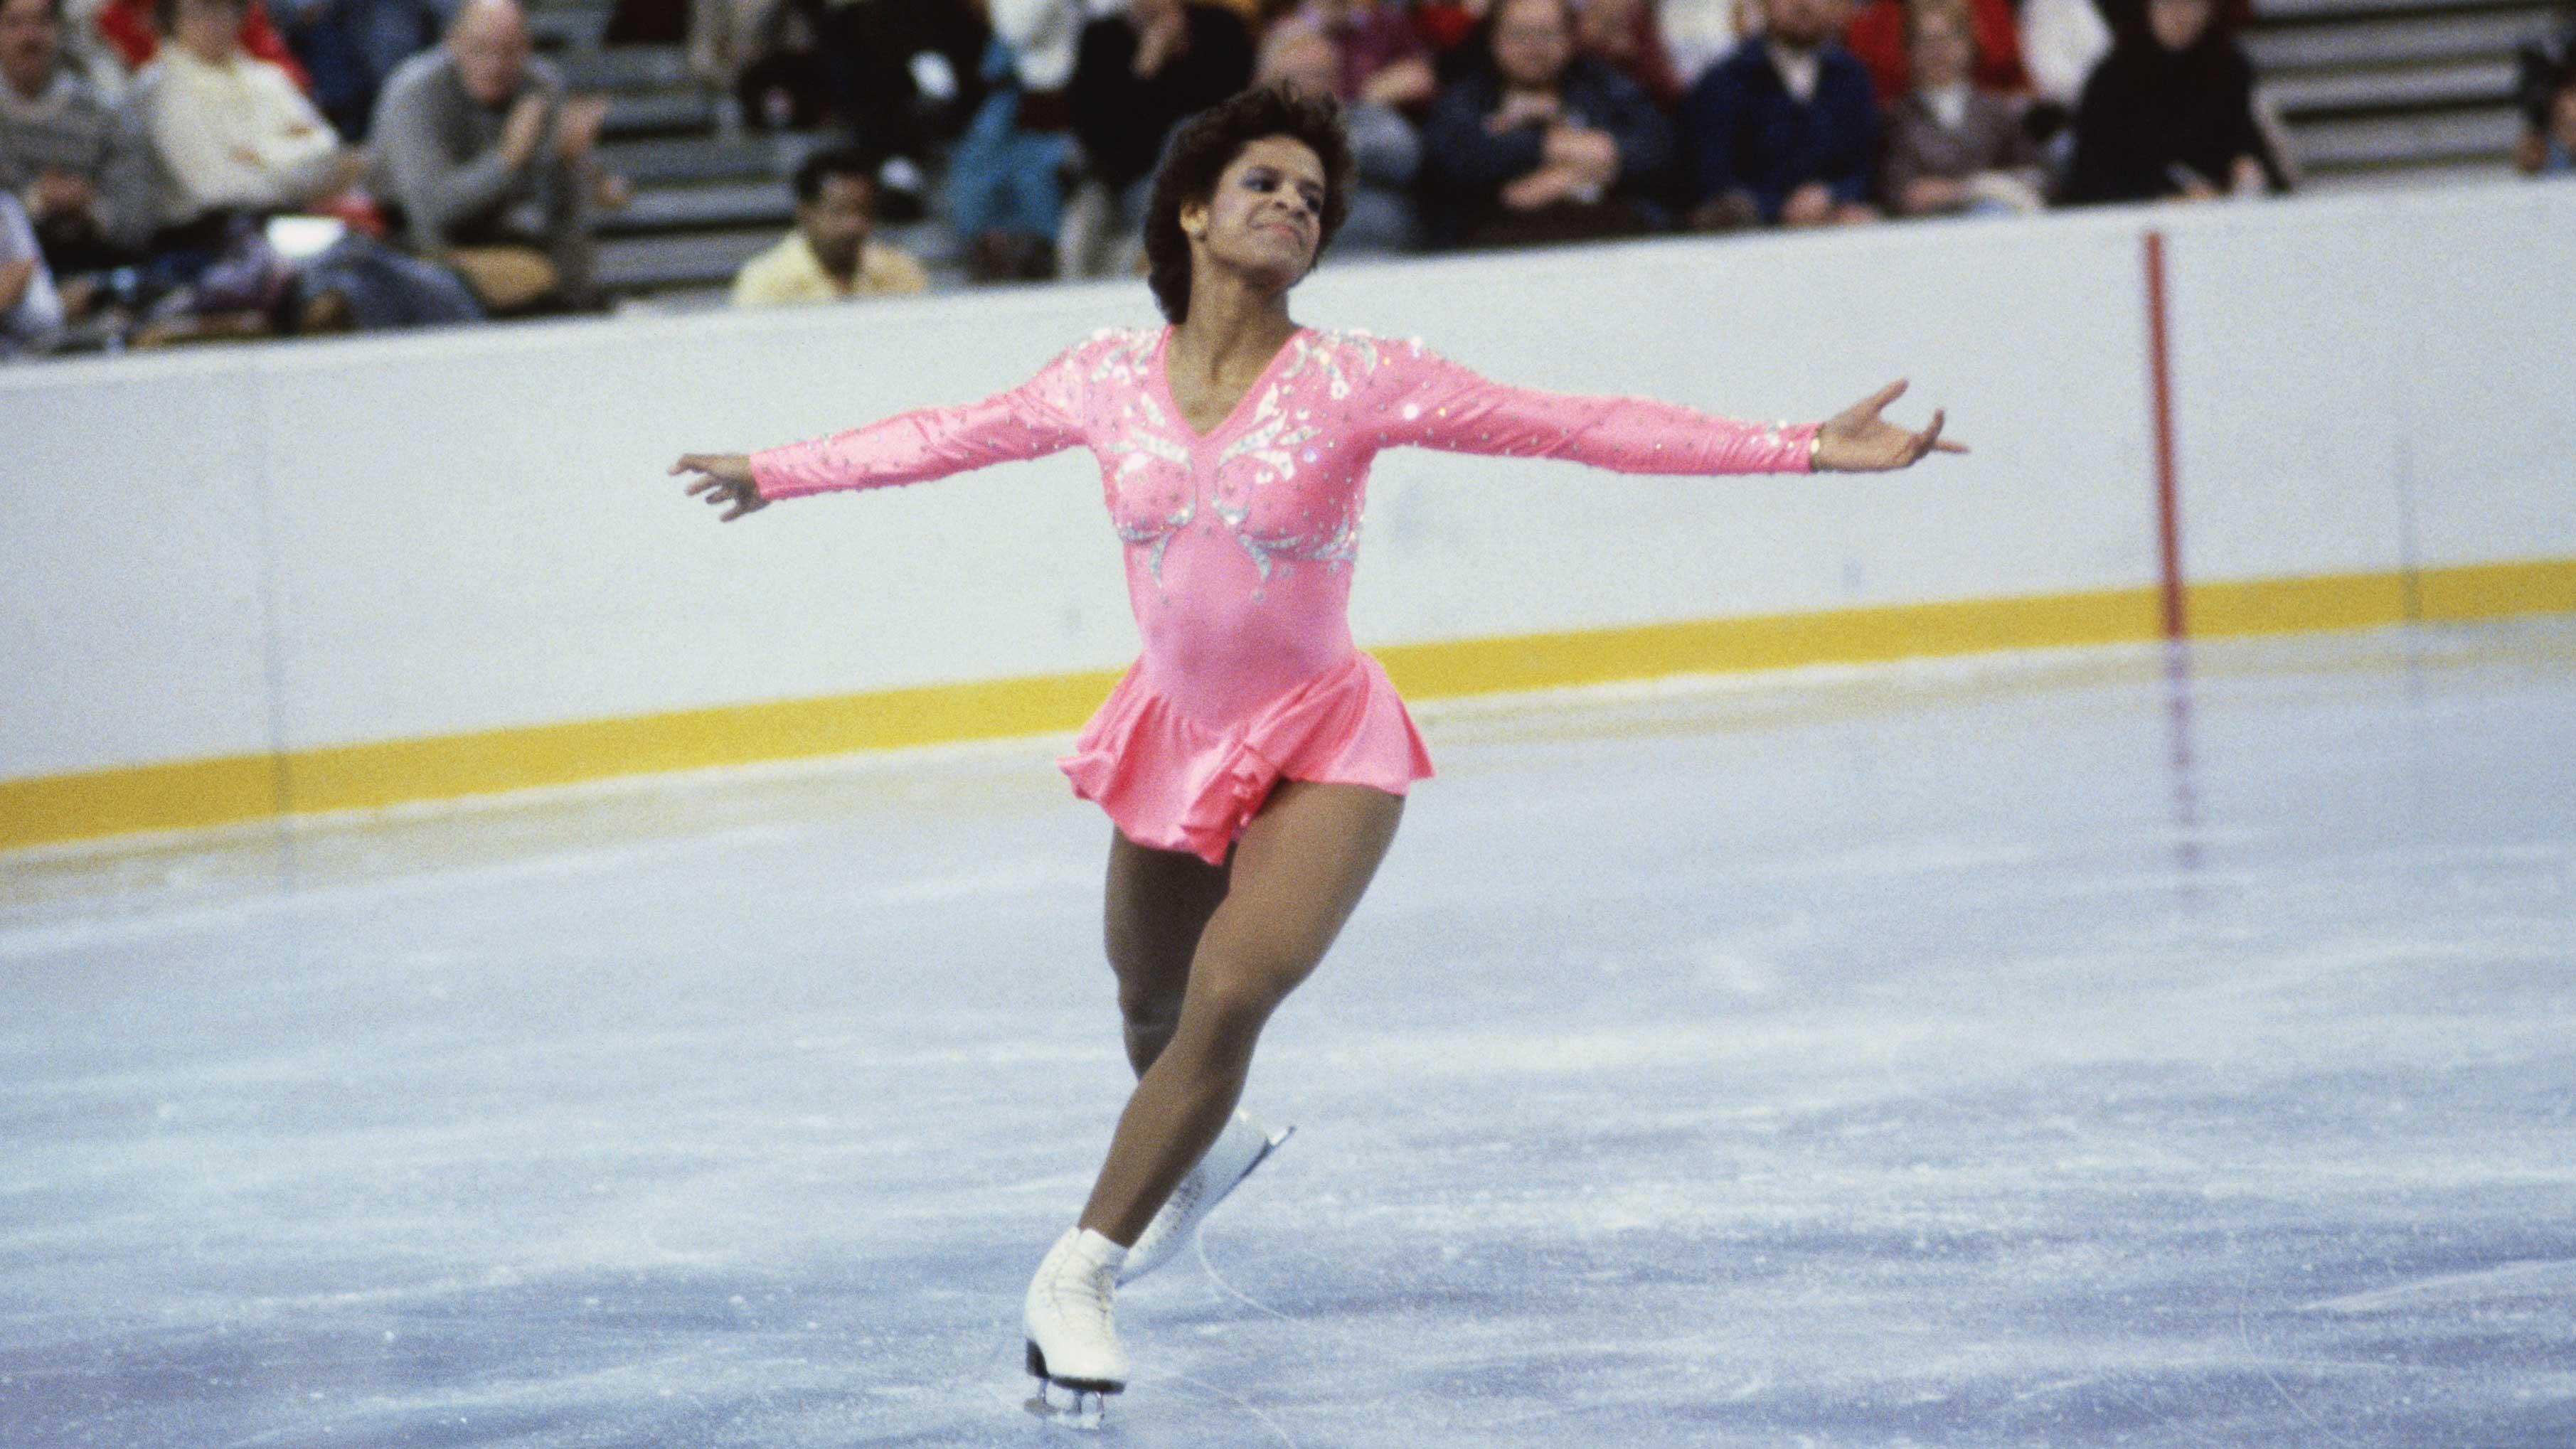 Portrait of Figure Skater Debi Thomas on the Ice